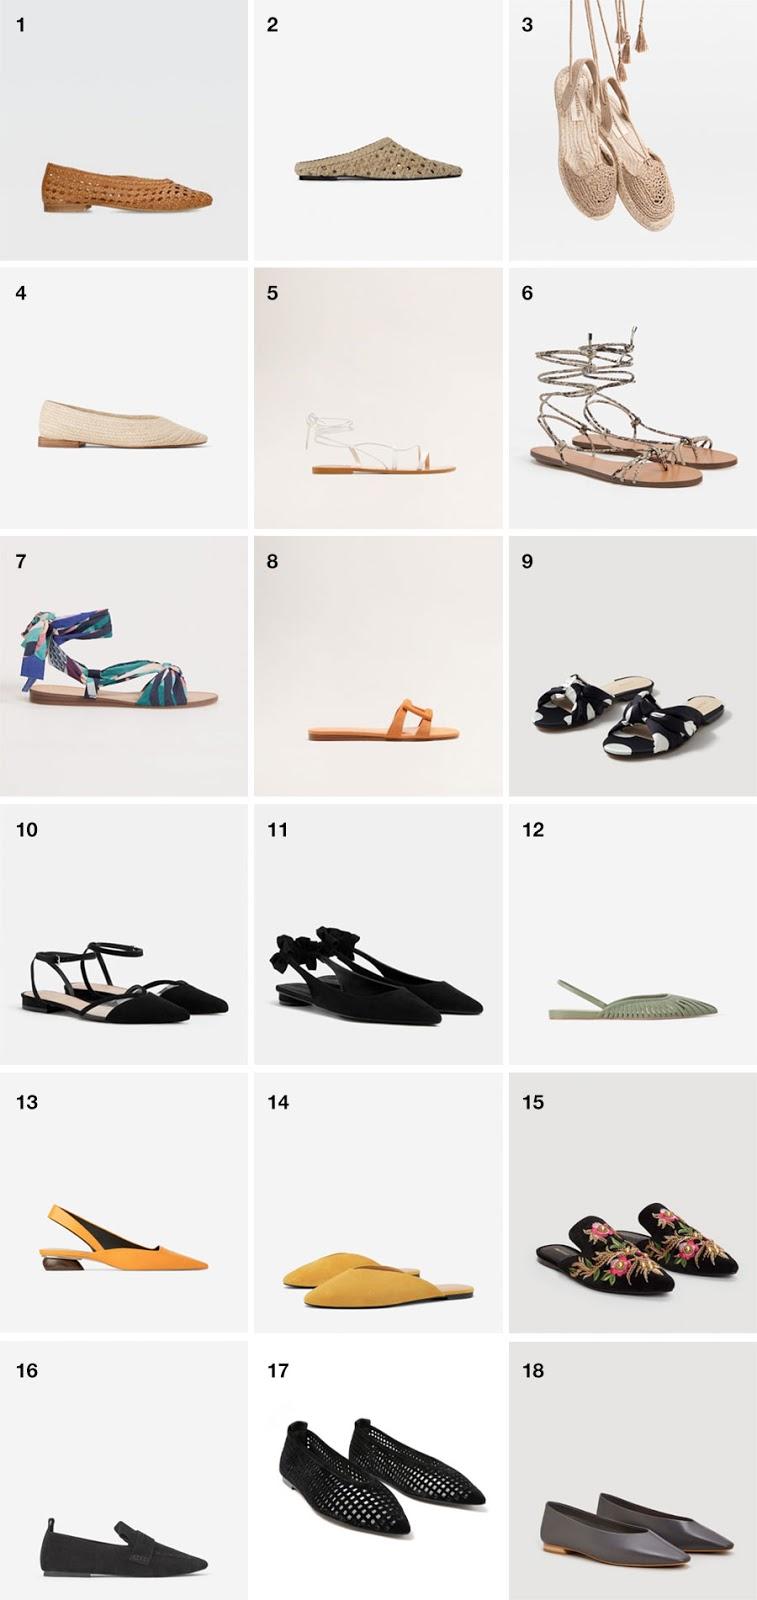 Zapatos Planos Verano.jpg